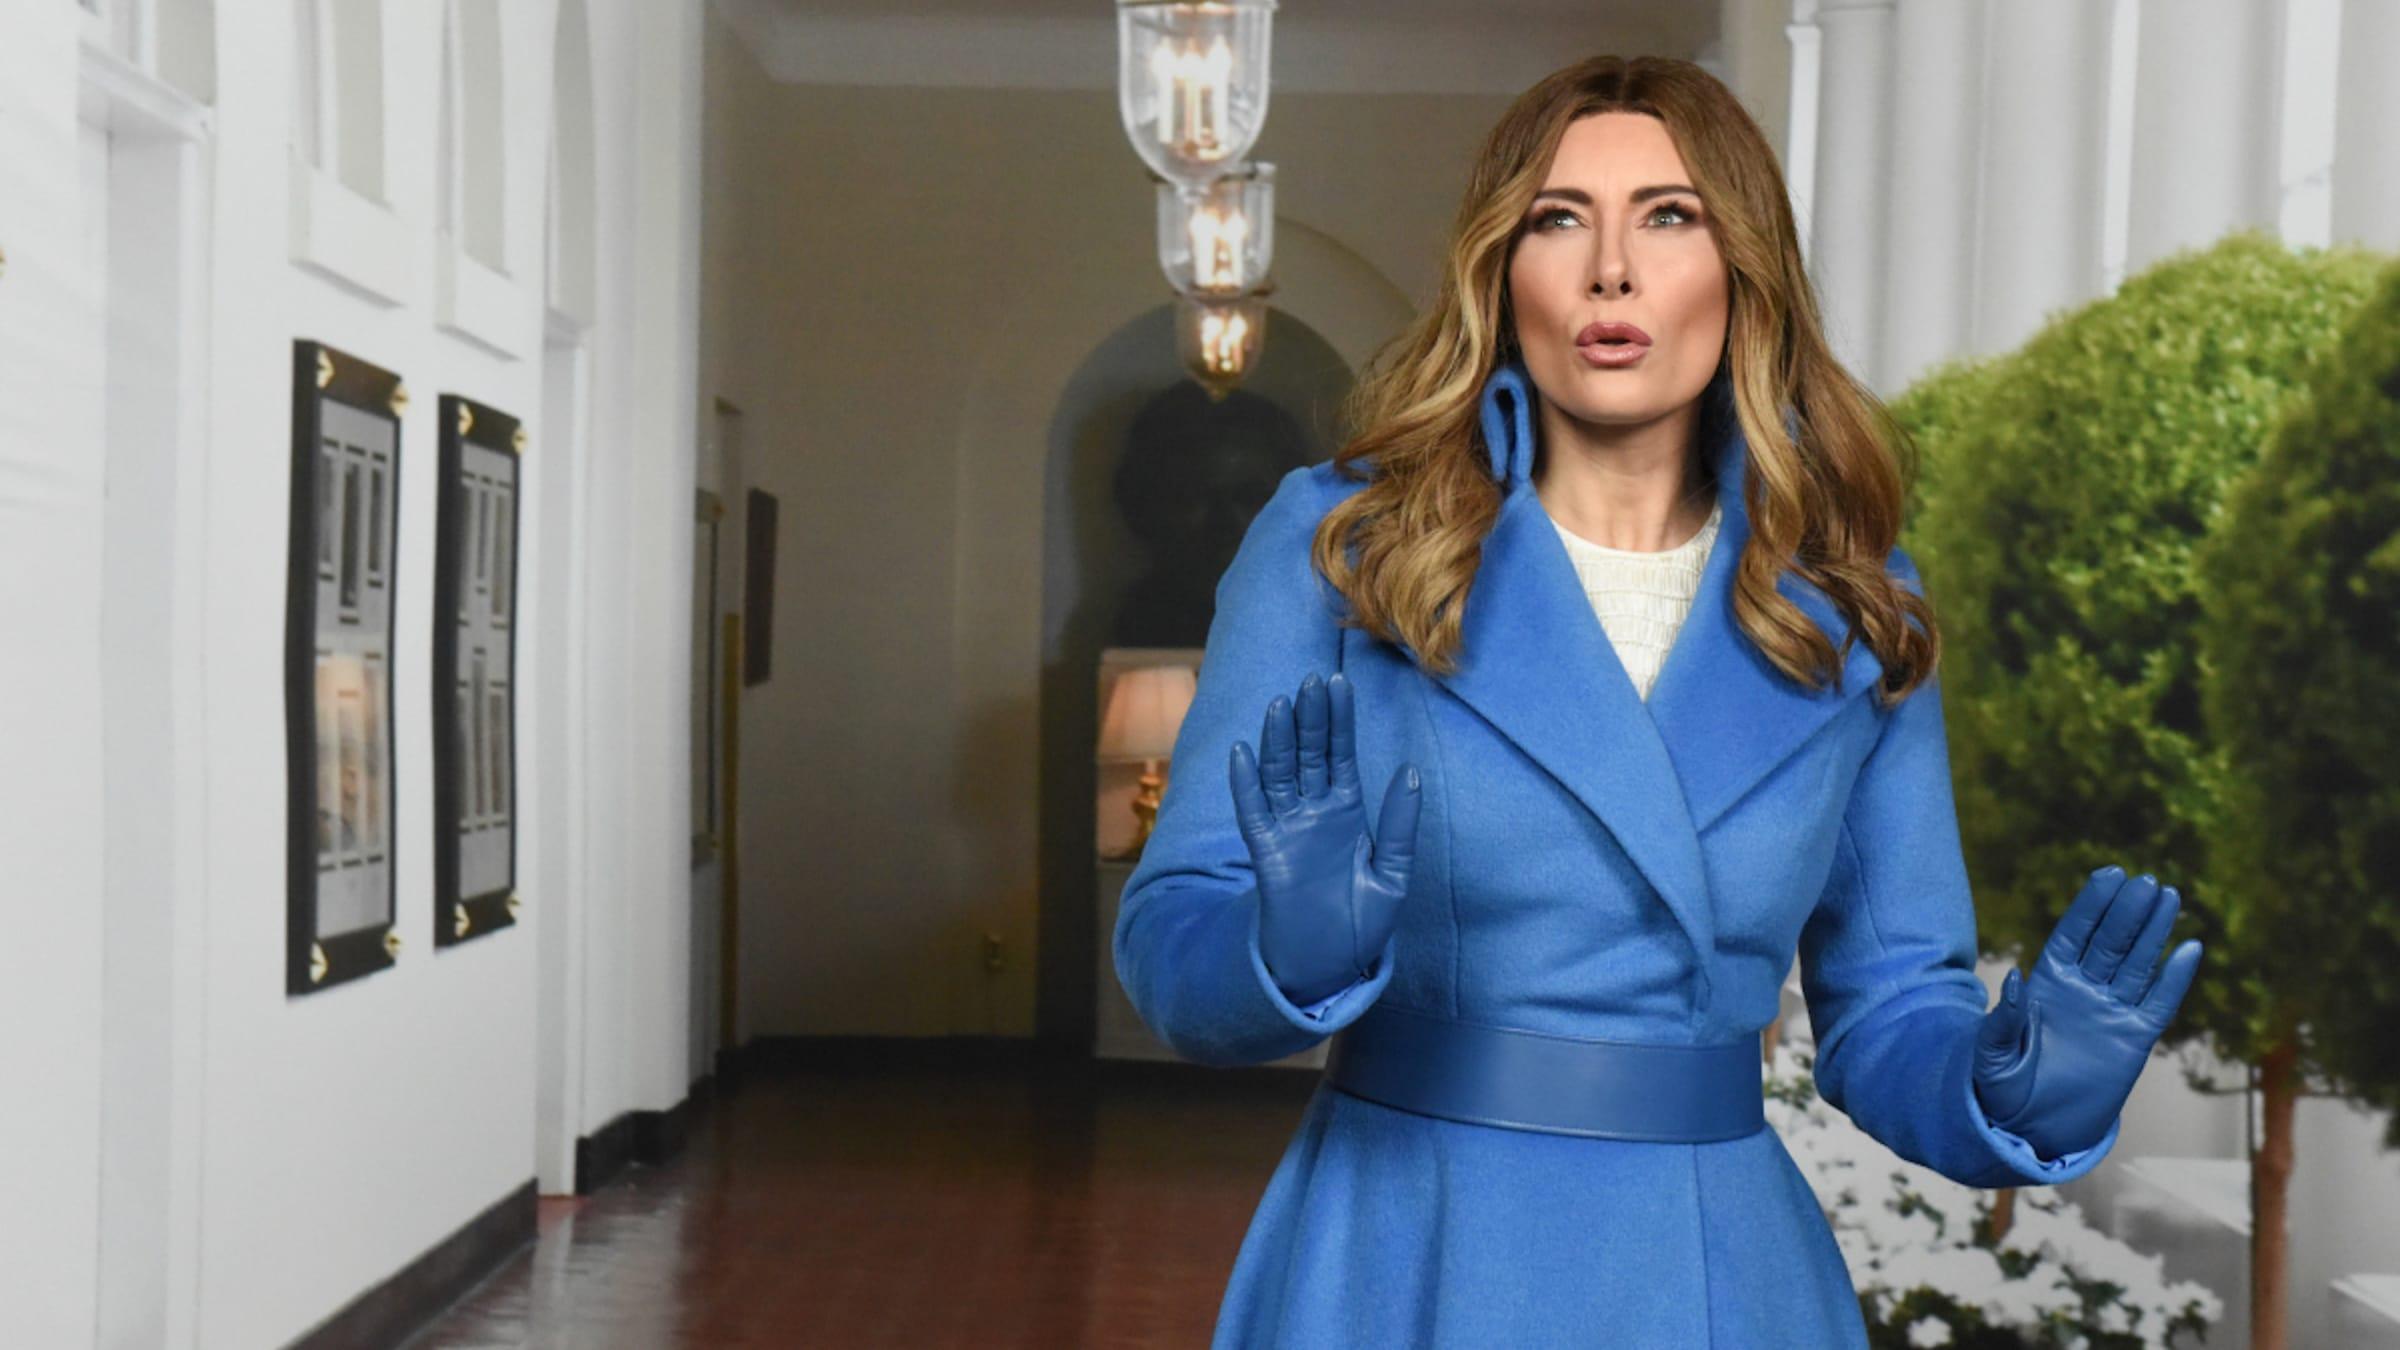 Colbert's' Laura Benanti Delivers One Last Musical 'Fuck Off' to Melania  Trump